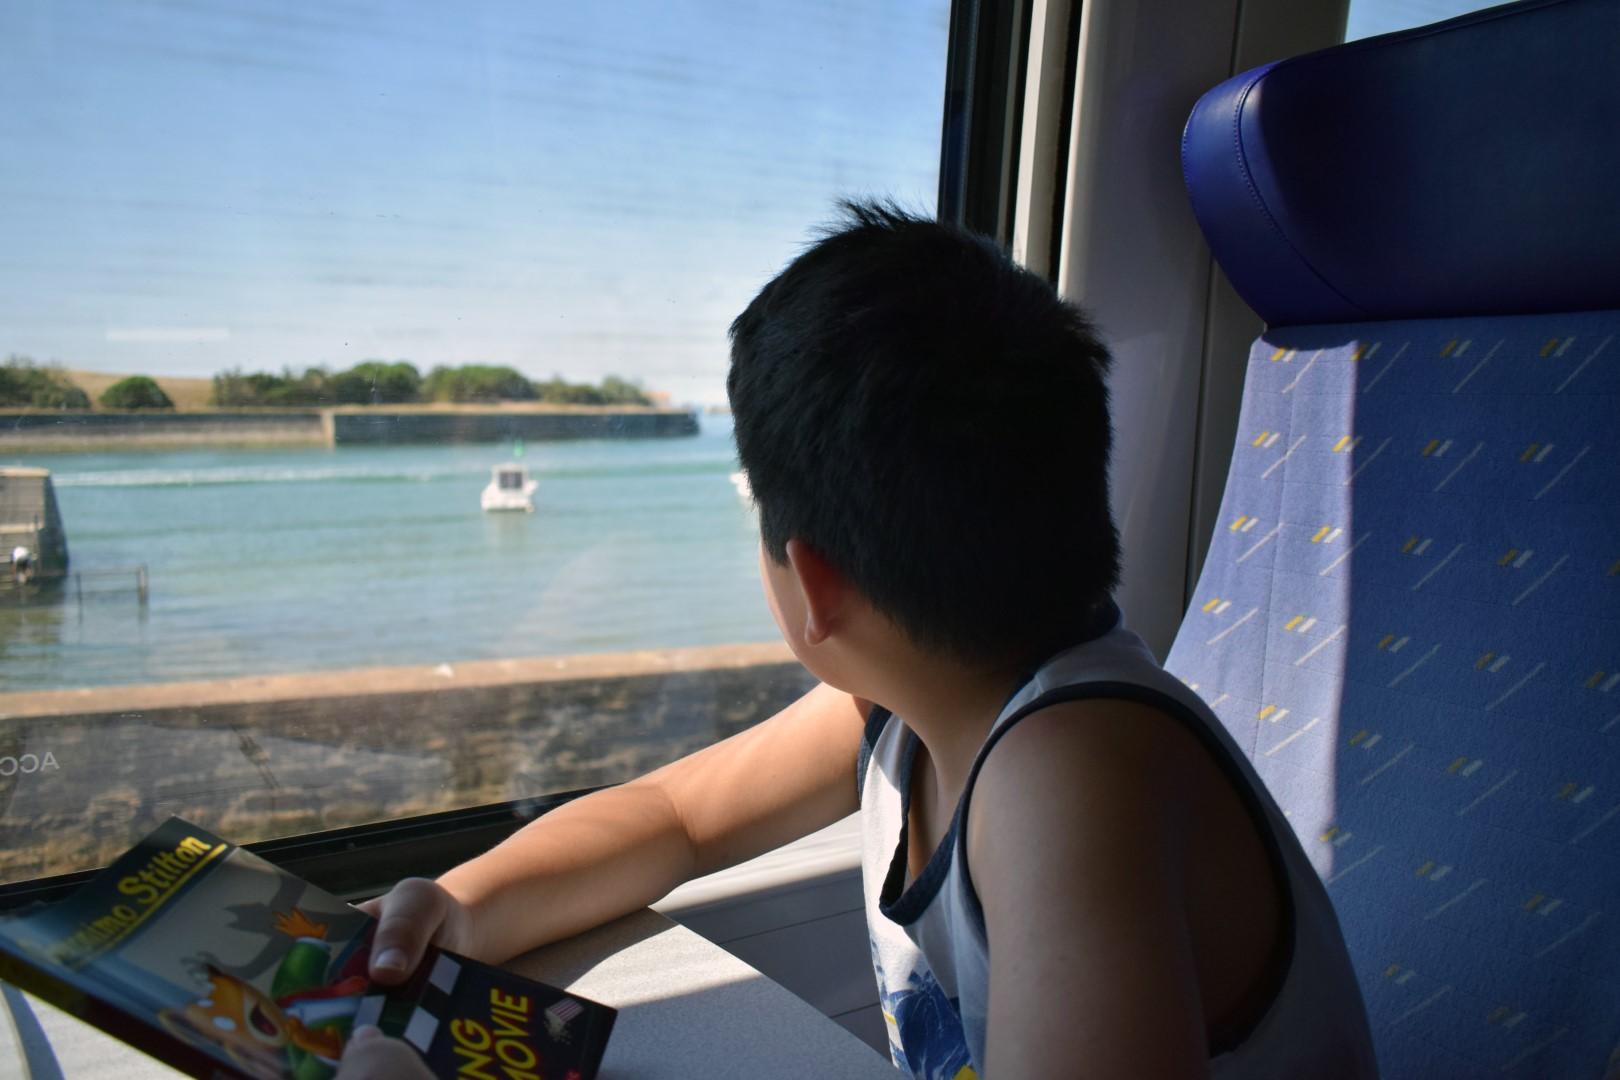 Arriving in Saint-Gilles-Croix-de-Vie